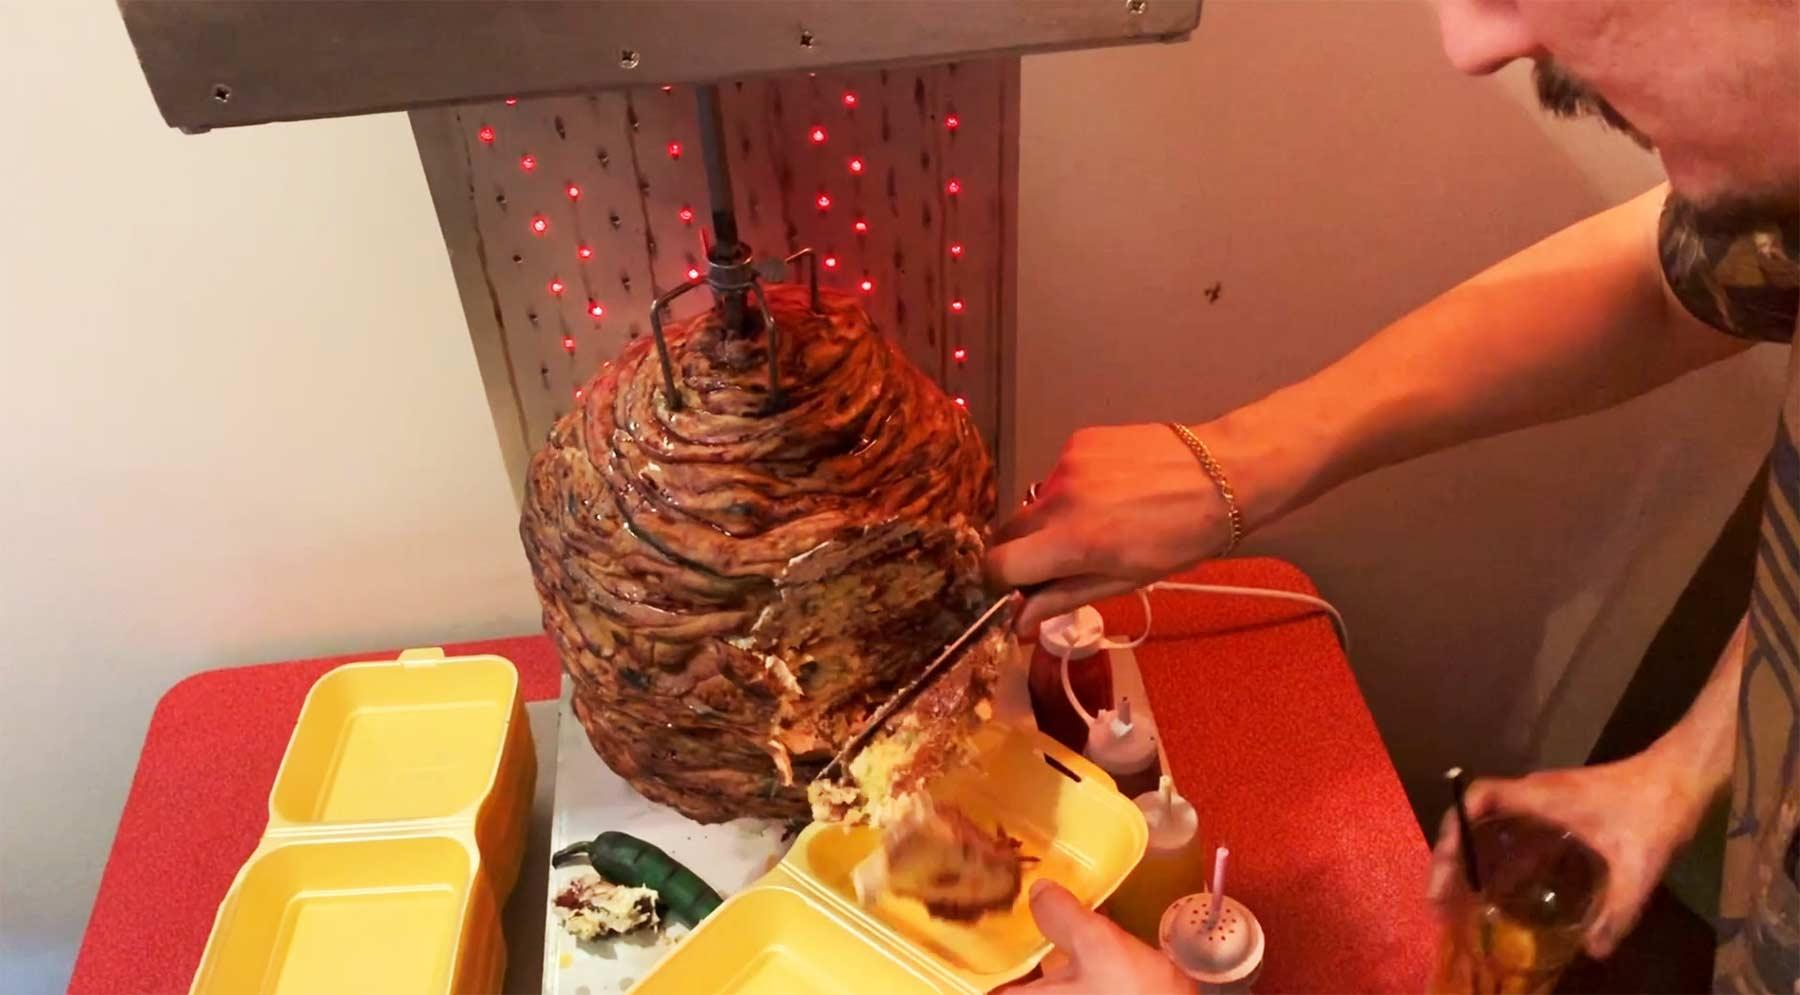 Döner-Kuchen doener-kuchen-kebab-cake